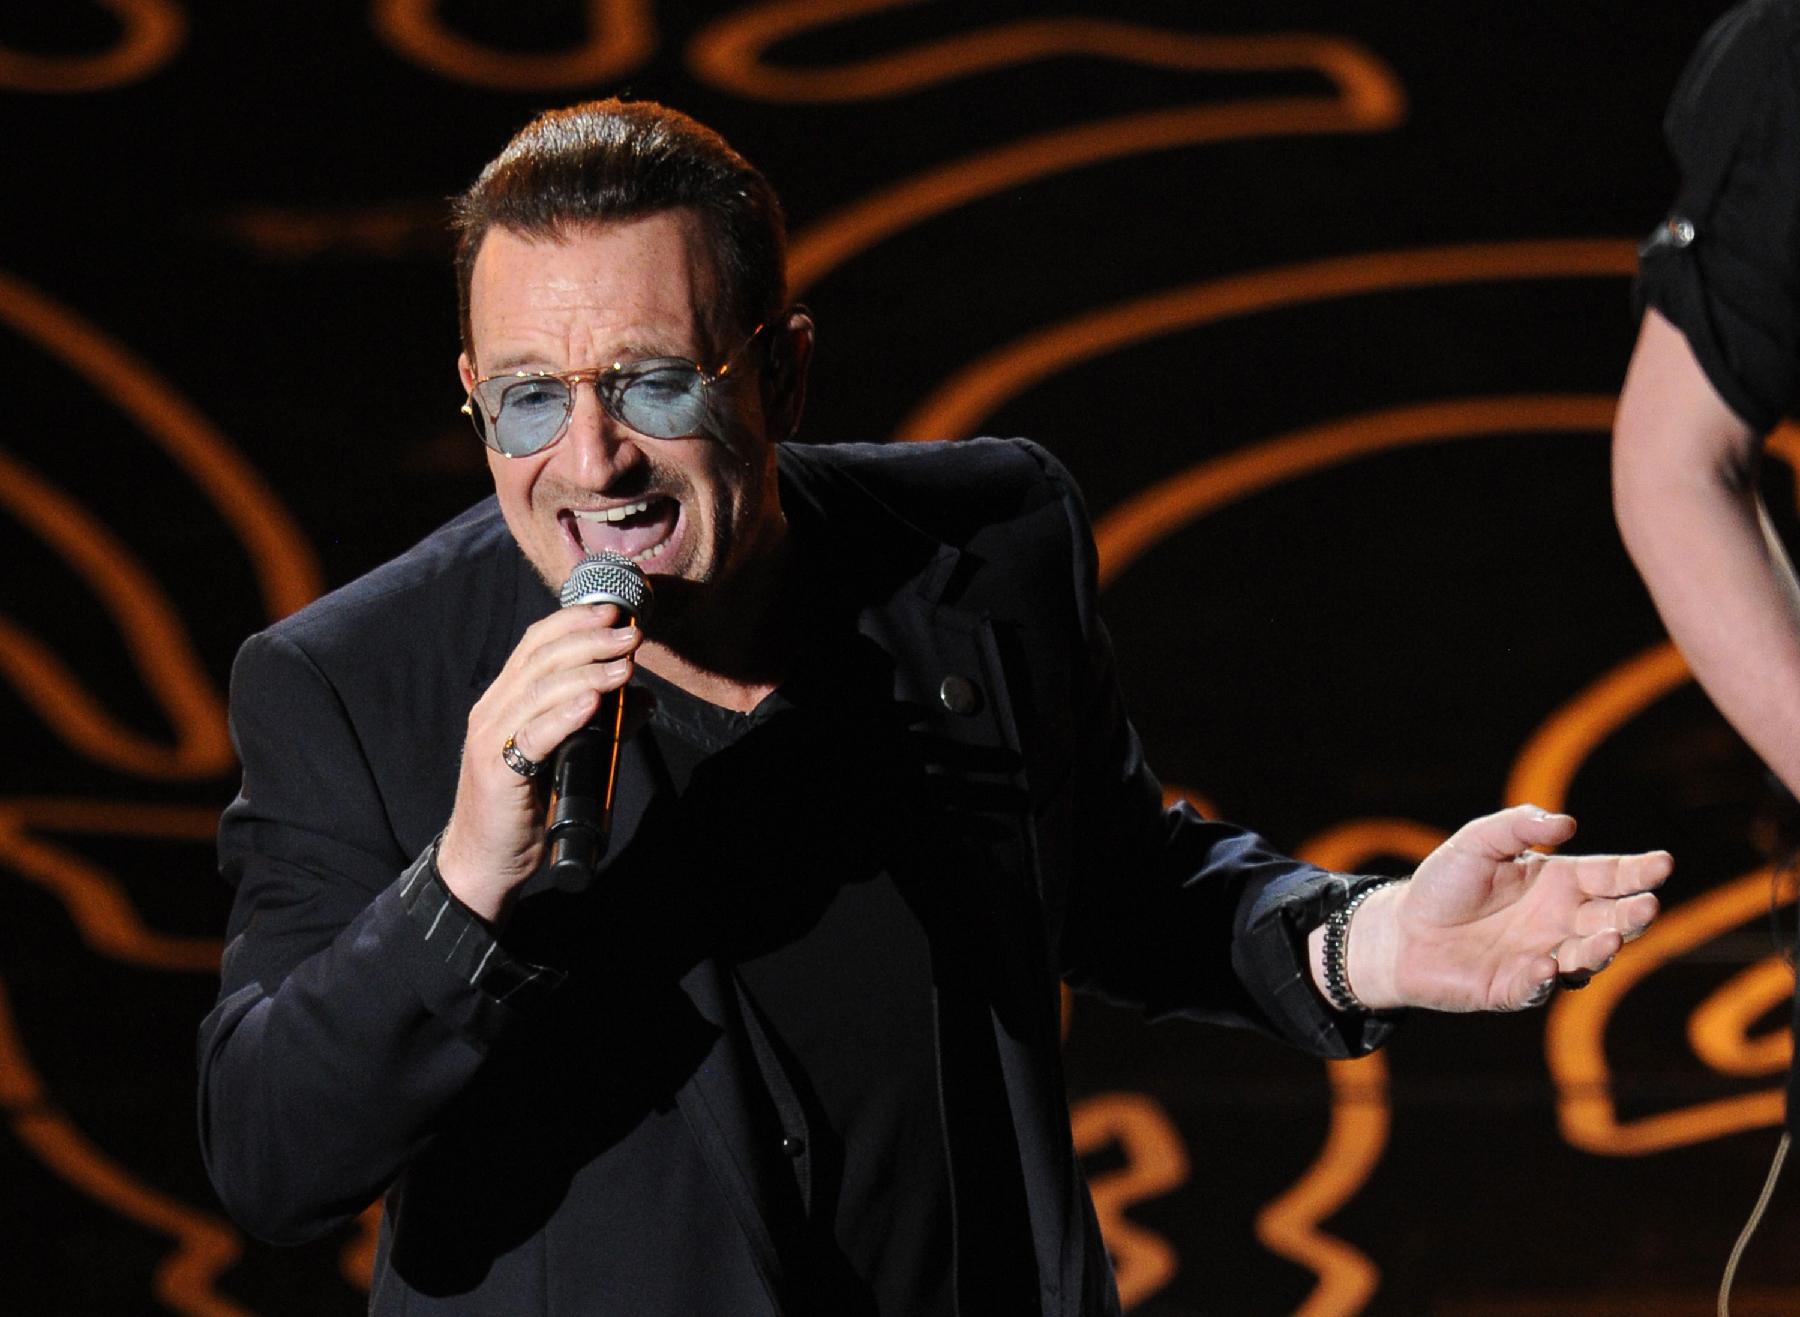 U2, Pharrell and Karen O Stun With Showstopping Oscar Performances